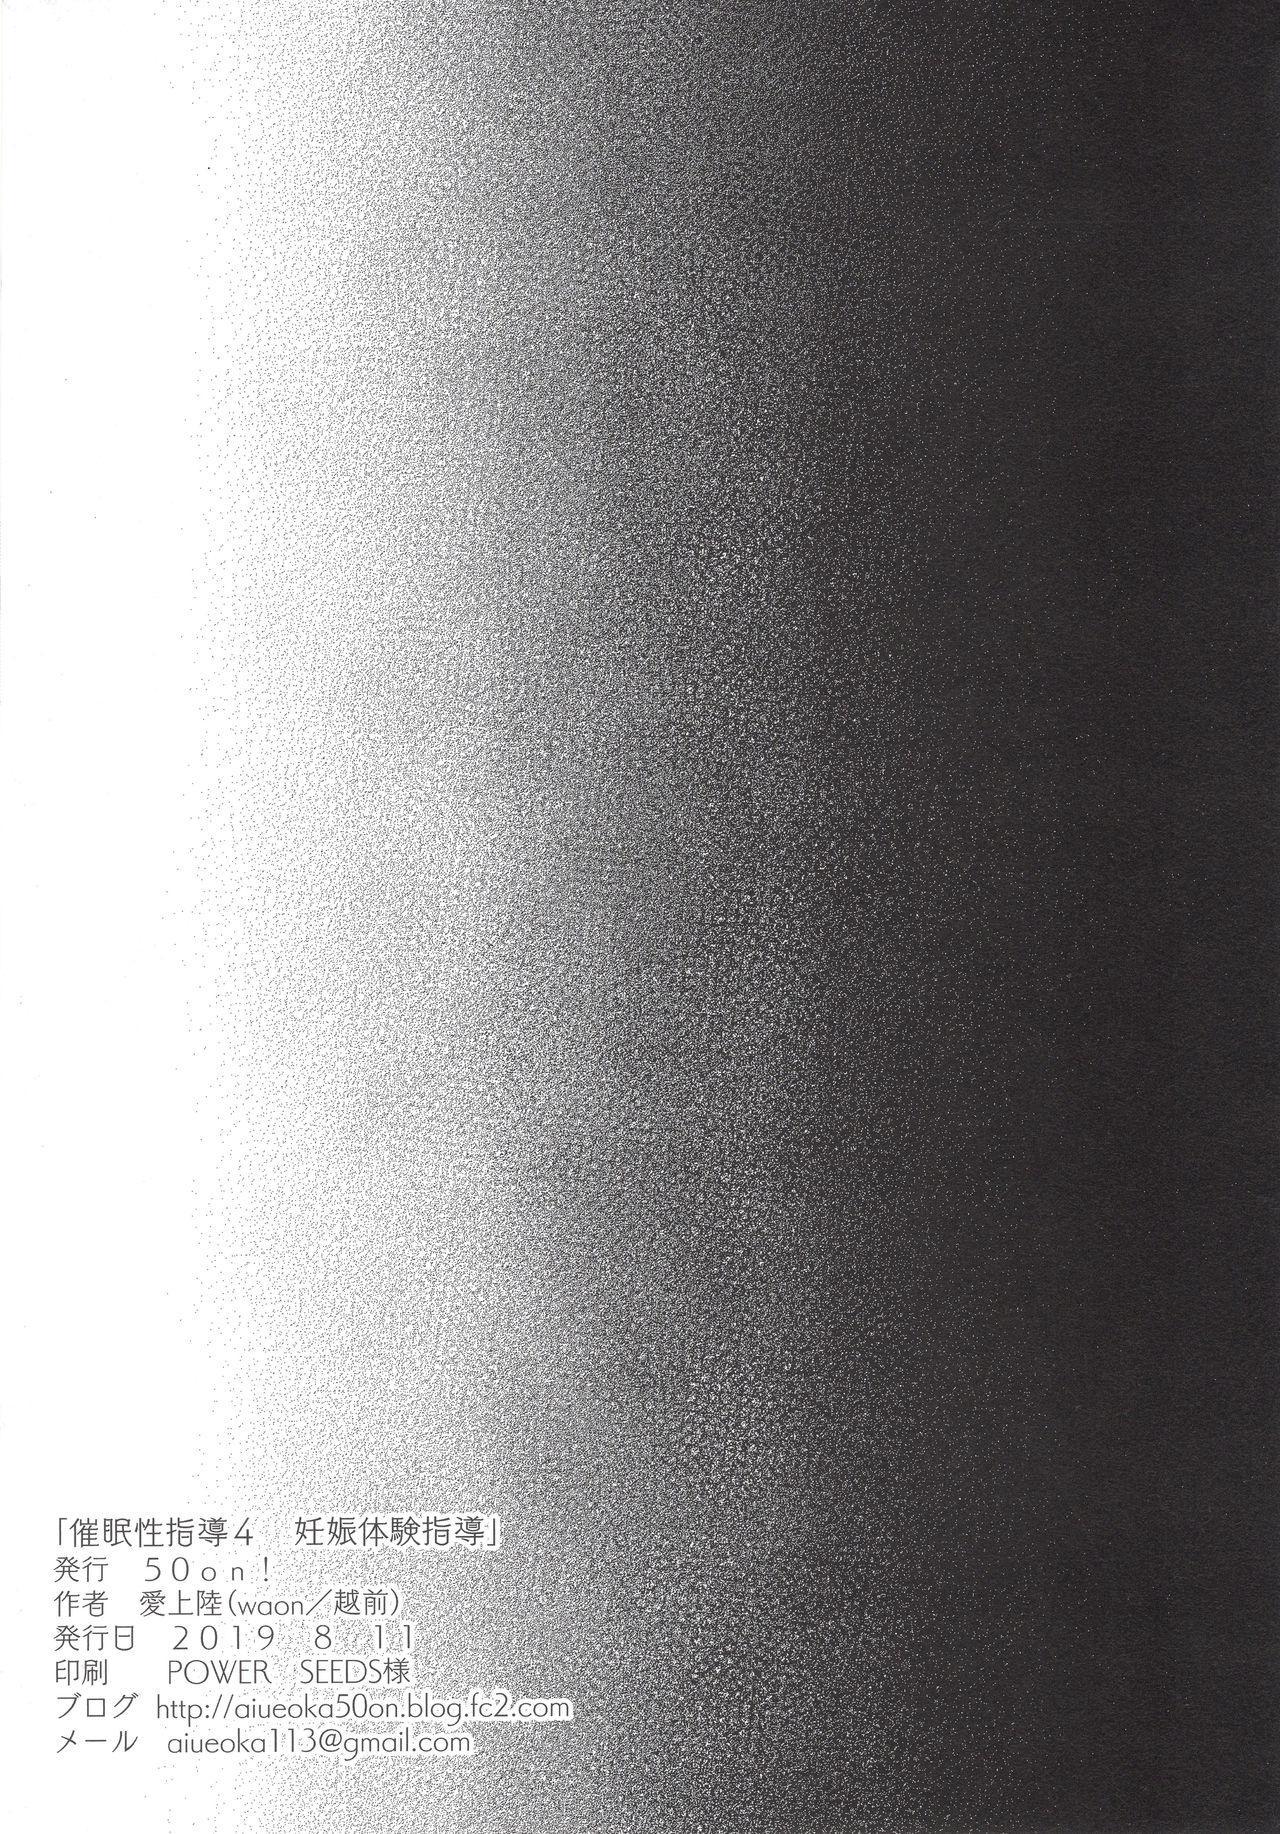 Saimin Seishidou 4: Ninshin Taiken Shidou 91